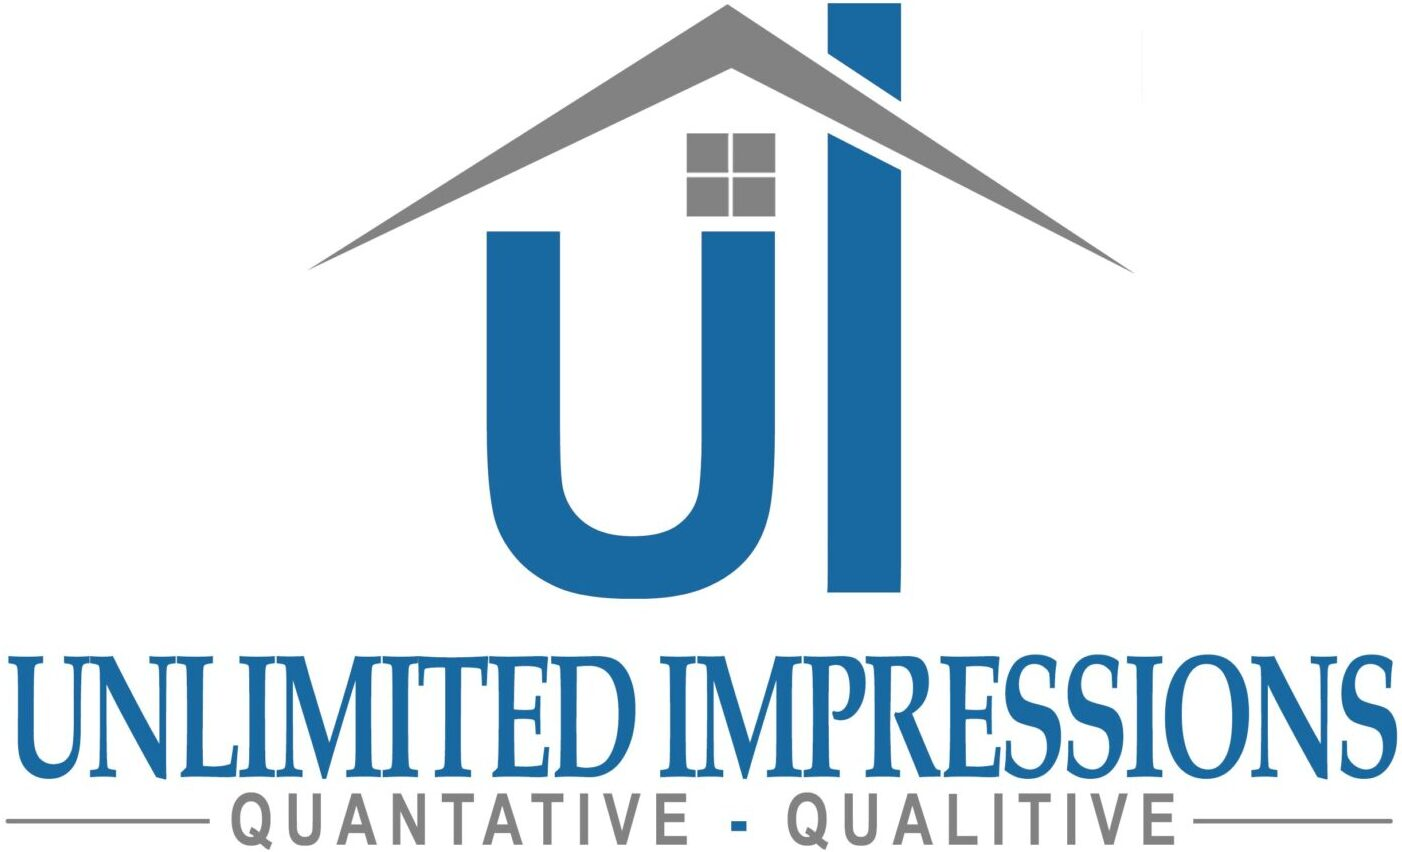 Unlimited Impressions Llc